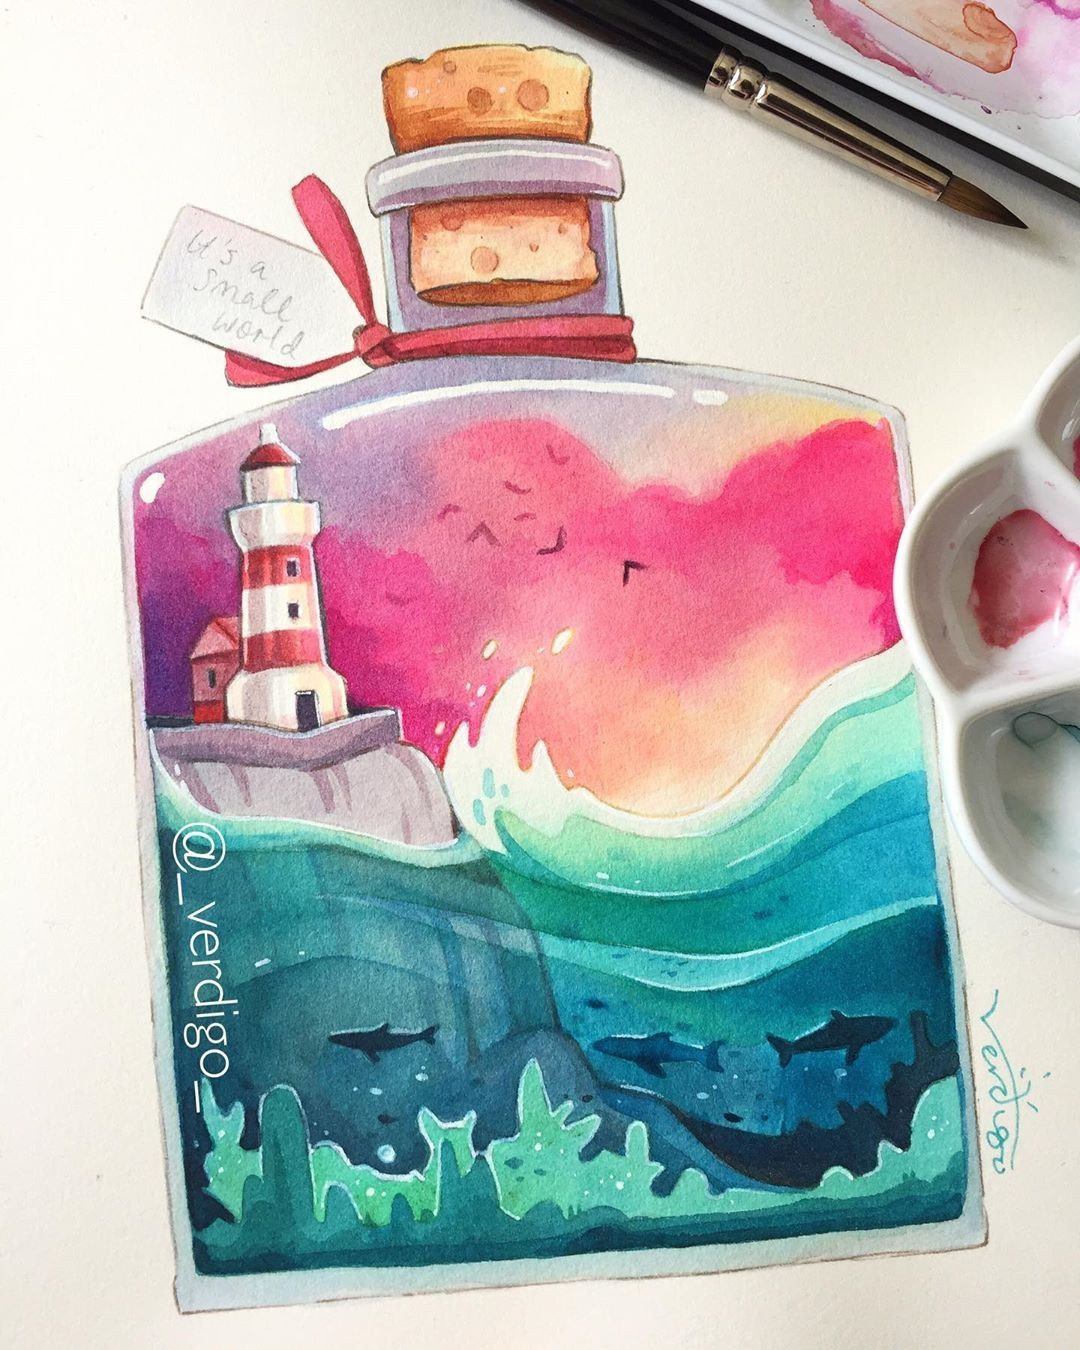 See more @ https://watercolorpainting.com #watercolor #watercolorpainting  #watercolor_art #wat…   Watercolor illustration, Illustration art drawing,  Watercolor art